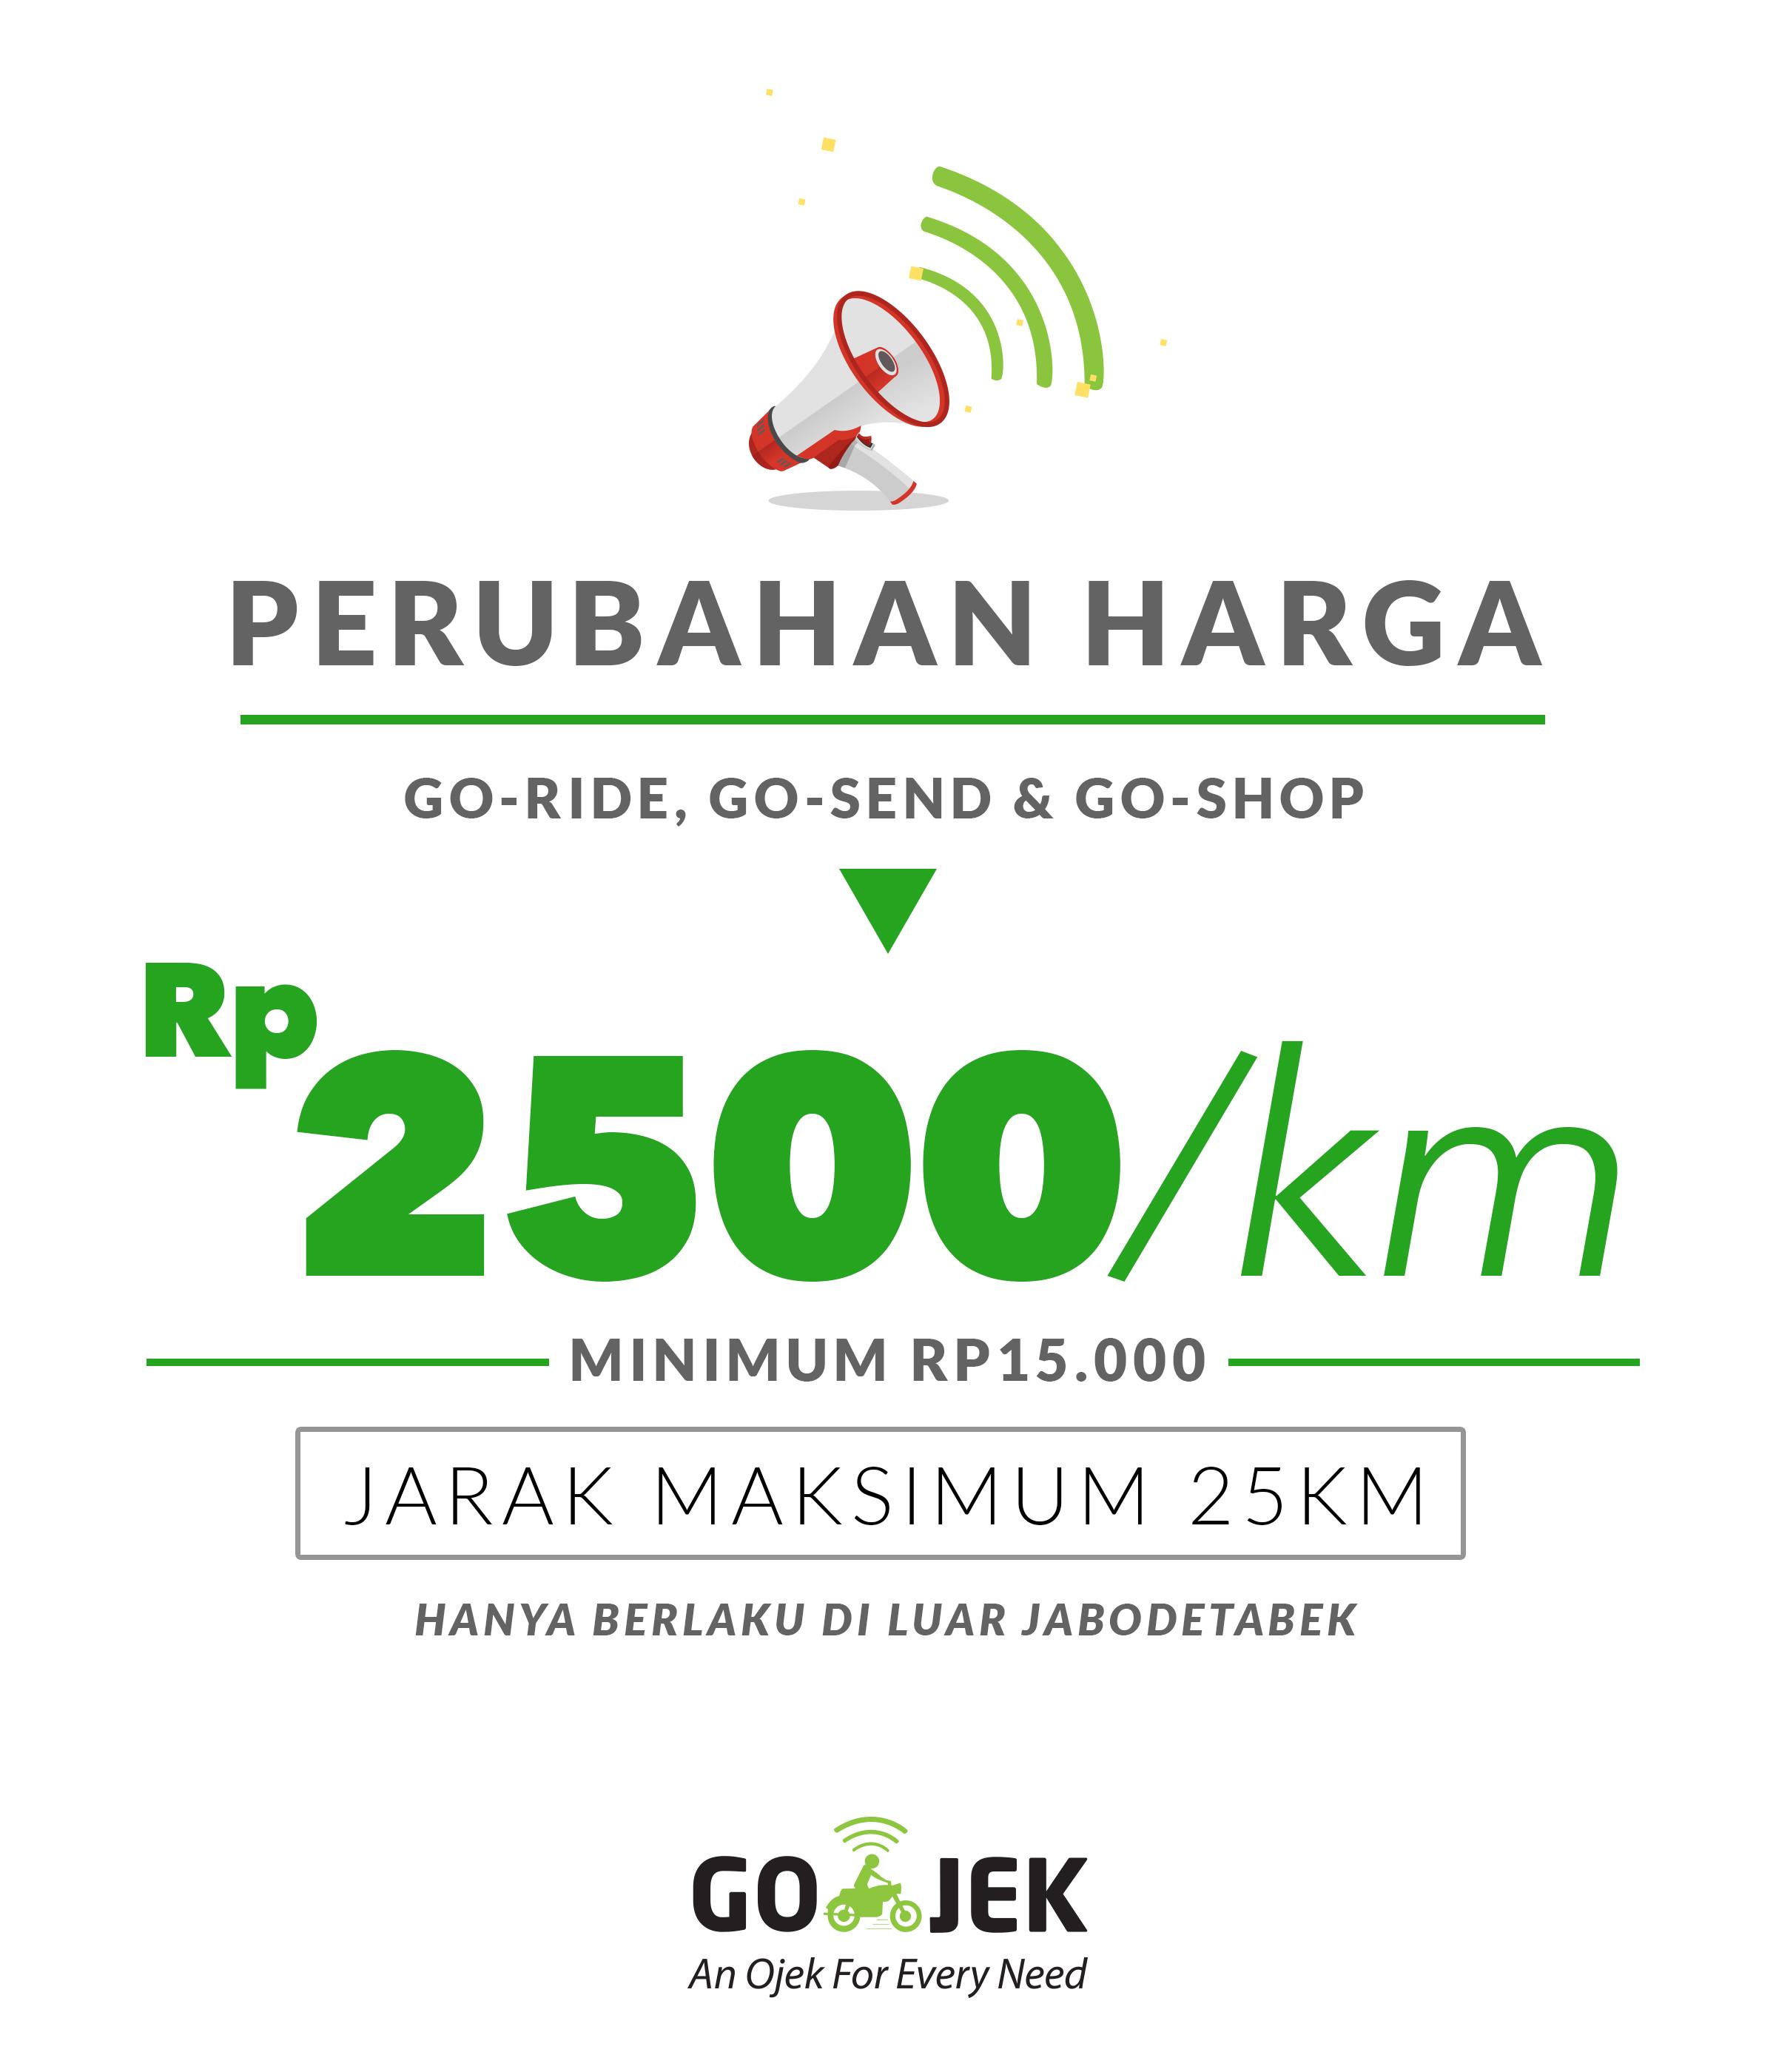 Go Jeck Pay: GO-JEK Indonesia